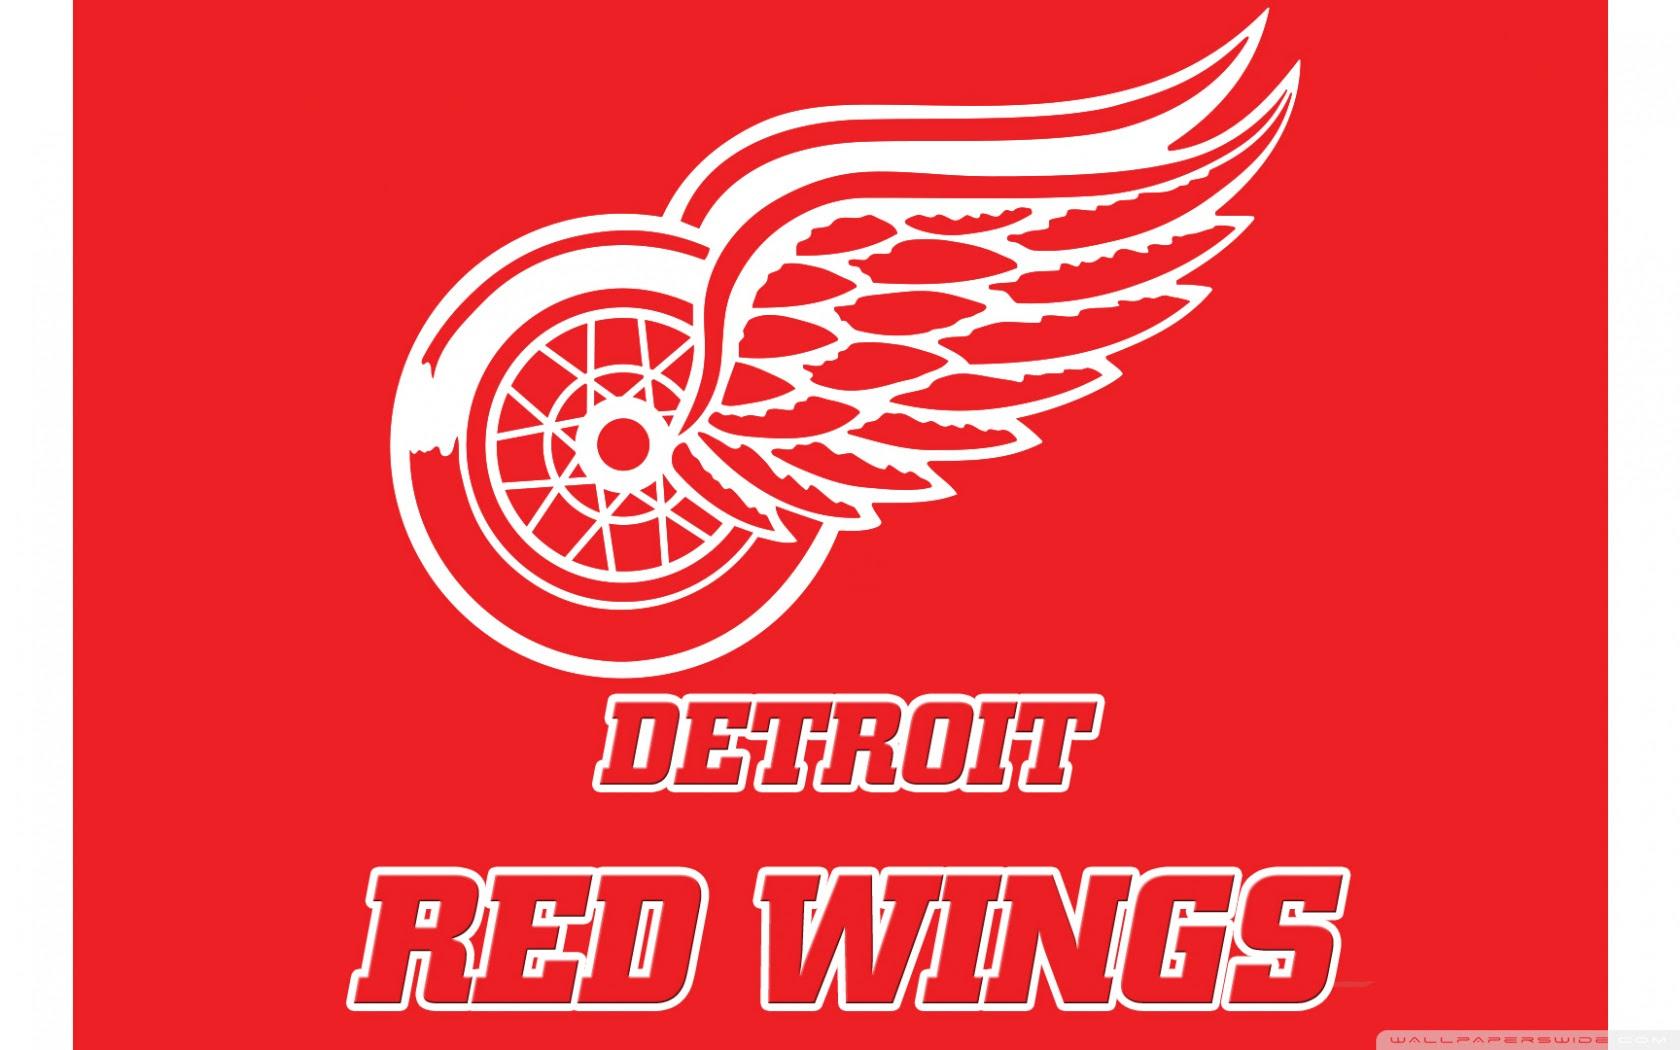 Detroit Red Wings Ultra Hd Desktop Background Wallpaper For 4k Uhd